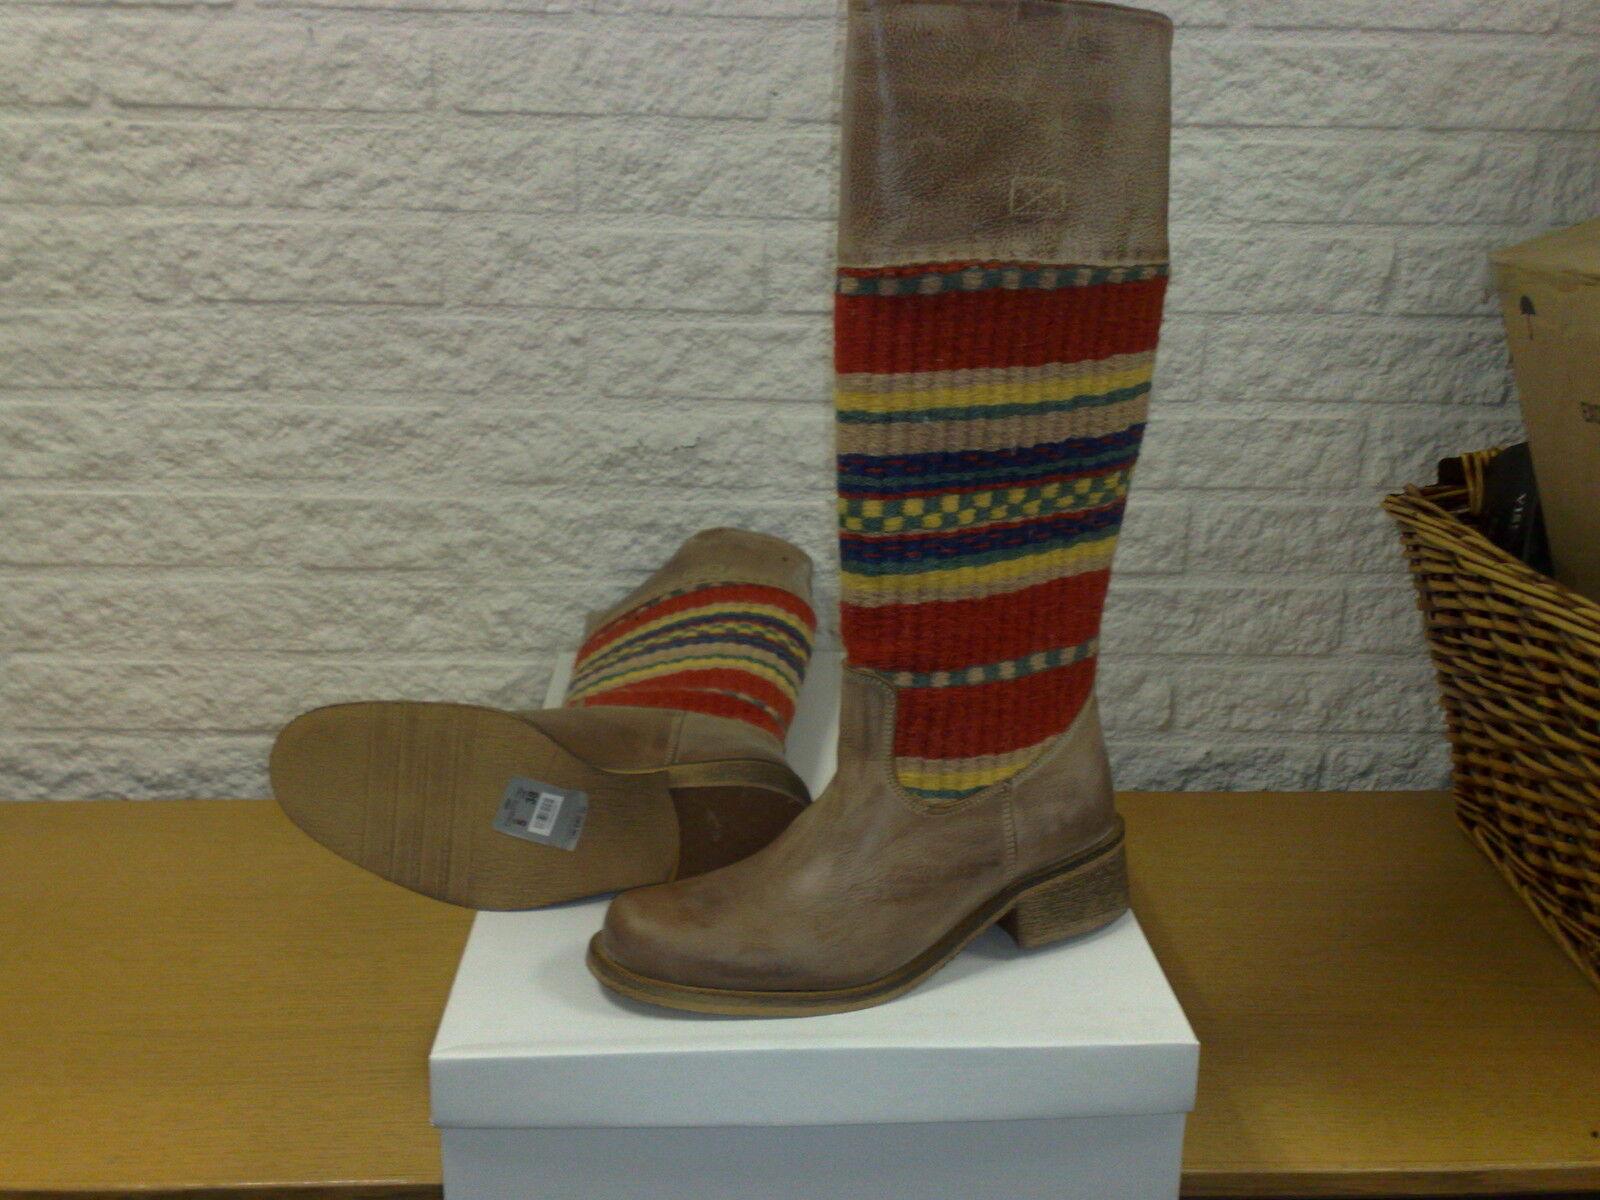 Haute Bottes Femmes KG,, kilim bottes style,, cuir véritable avec tapis,, NEUF